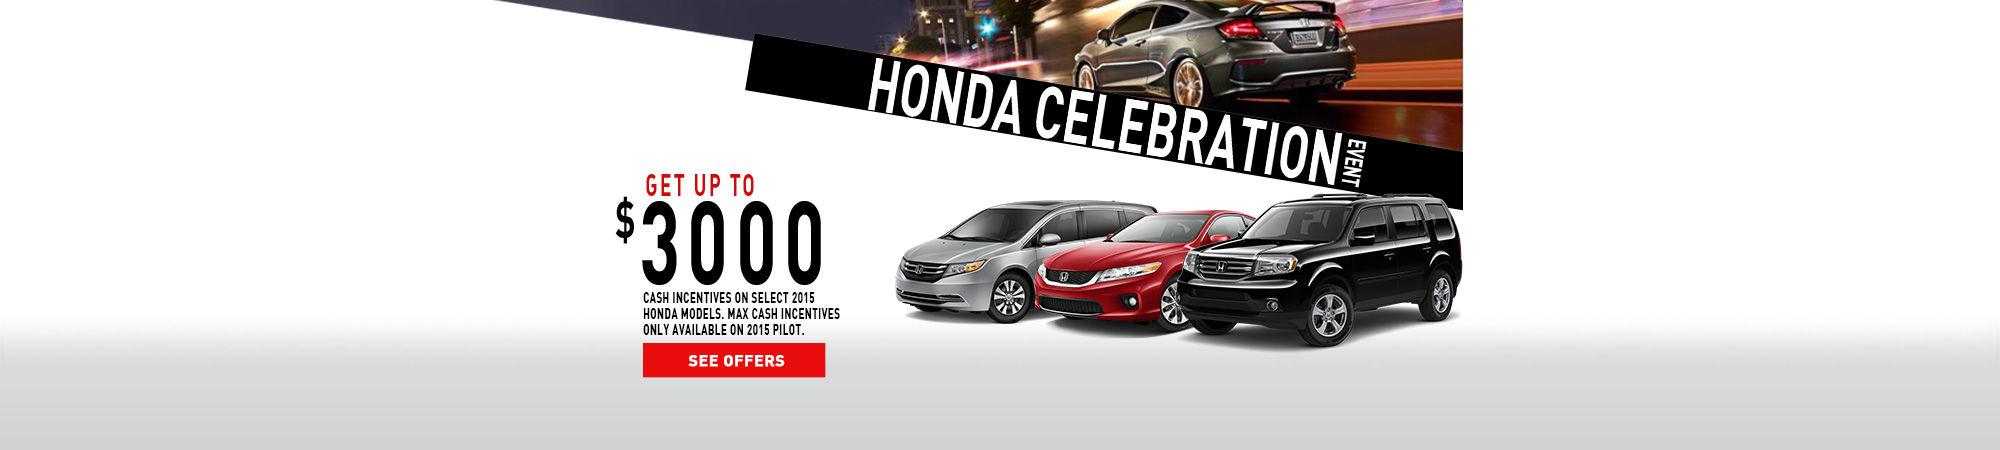 Honda Celebration -Event - February